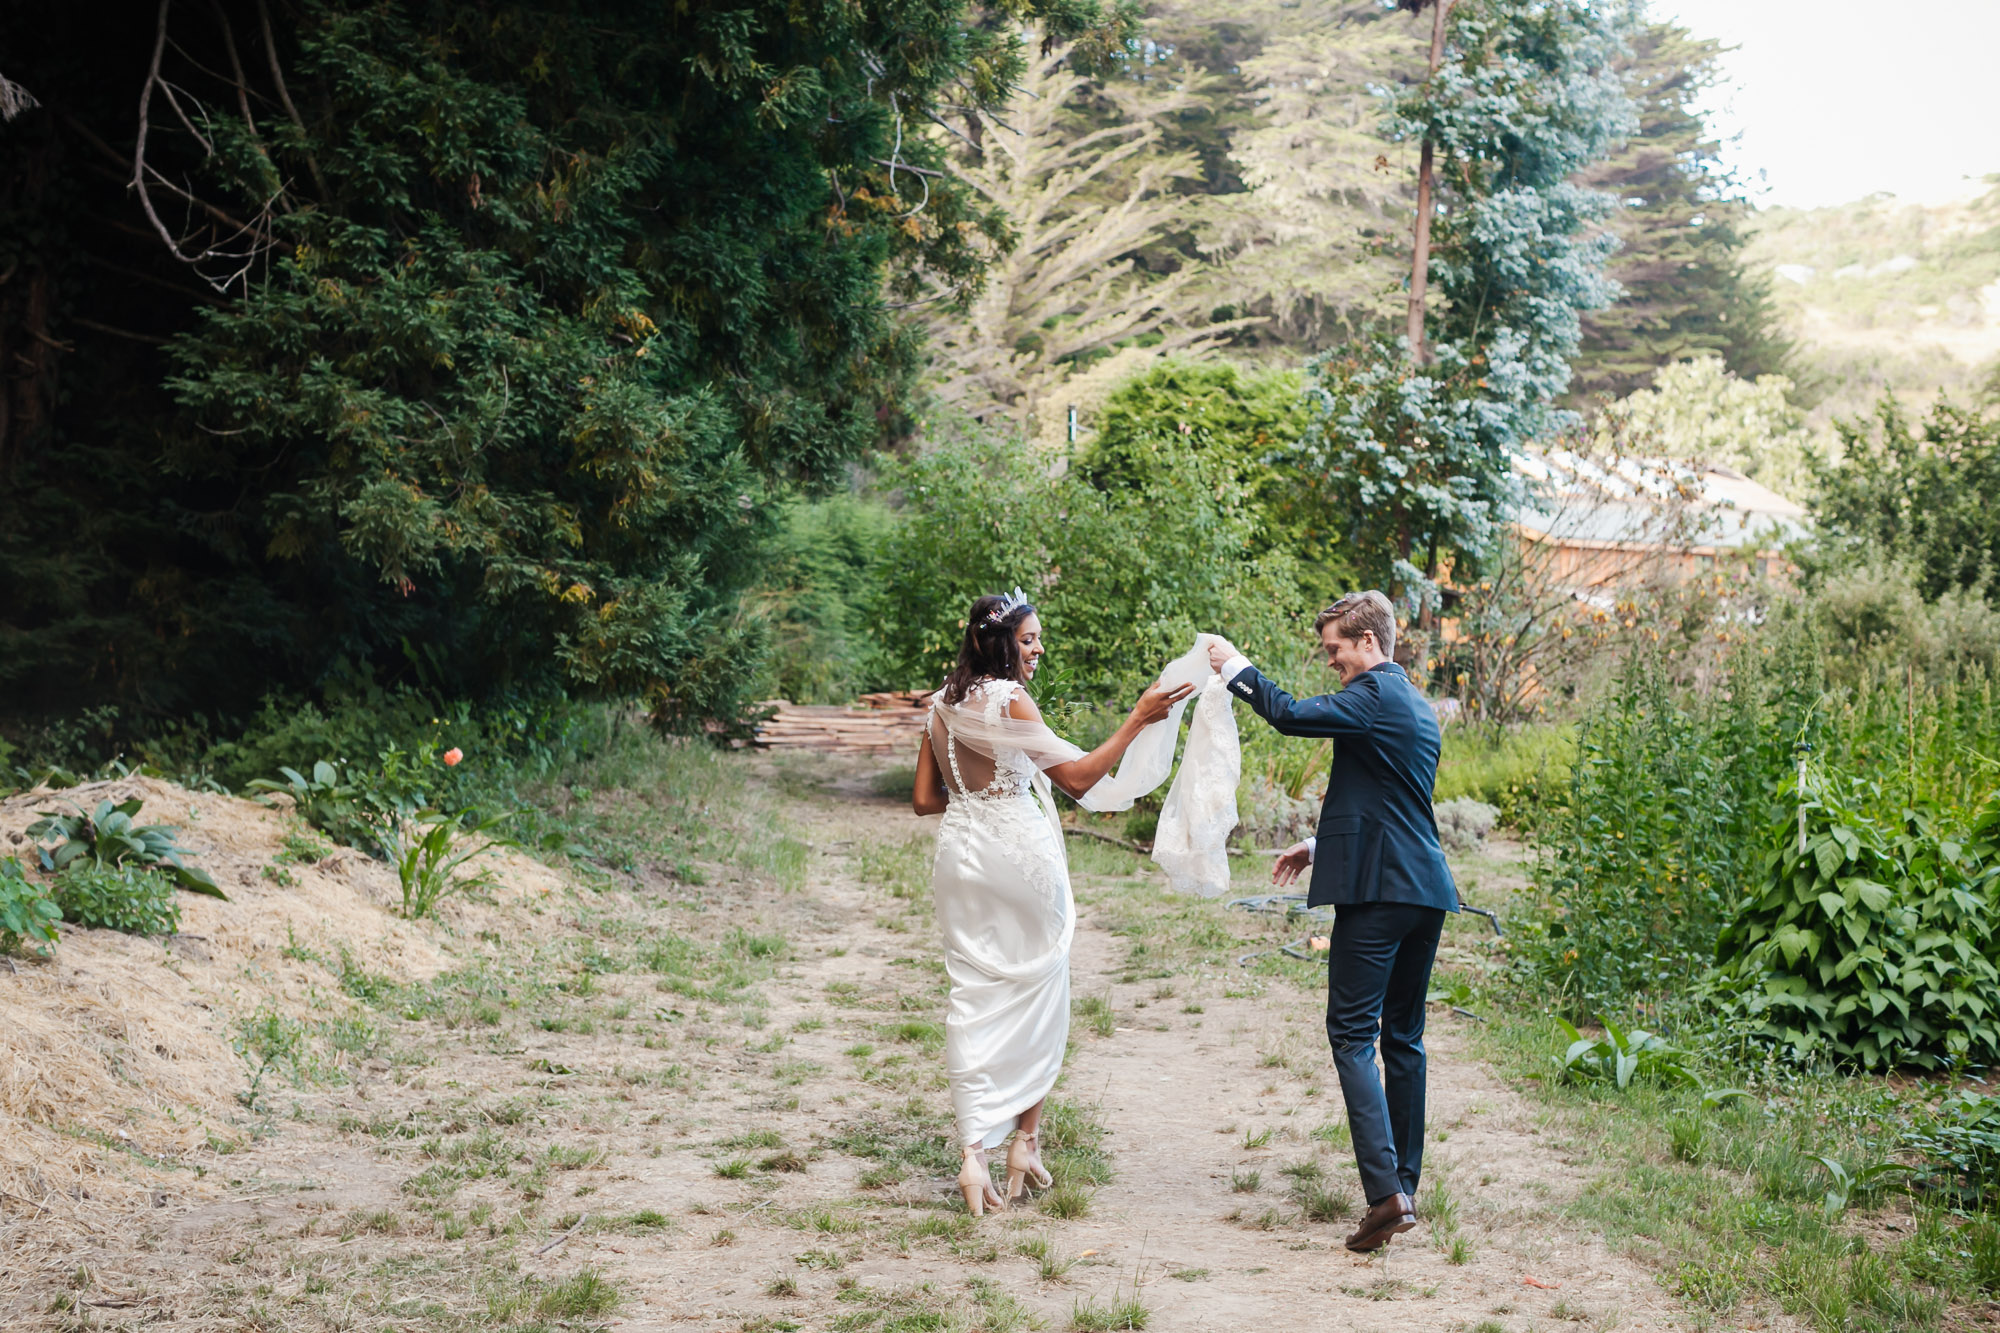 Groom helps his bride with her veil as they walk through coastal farm